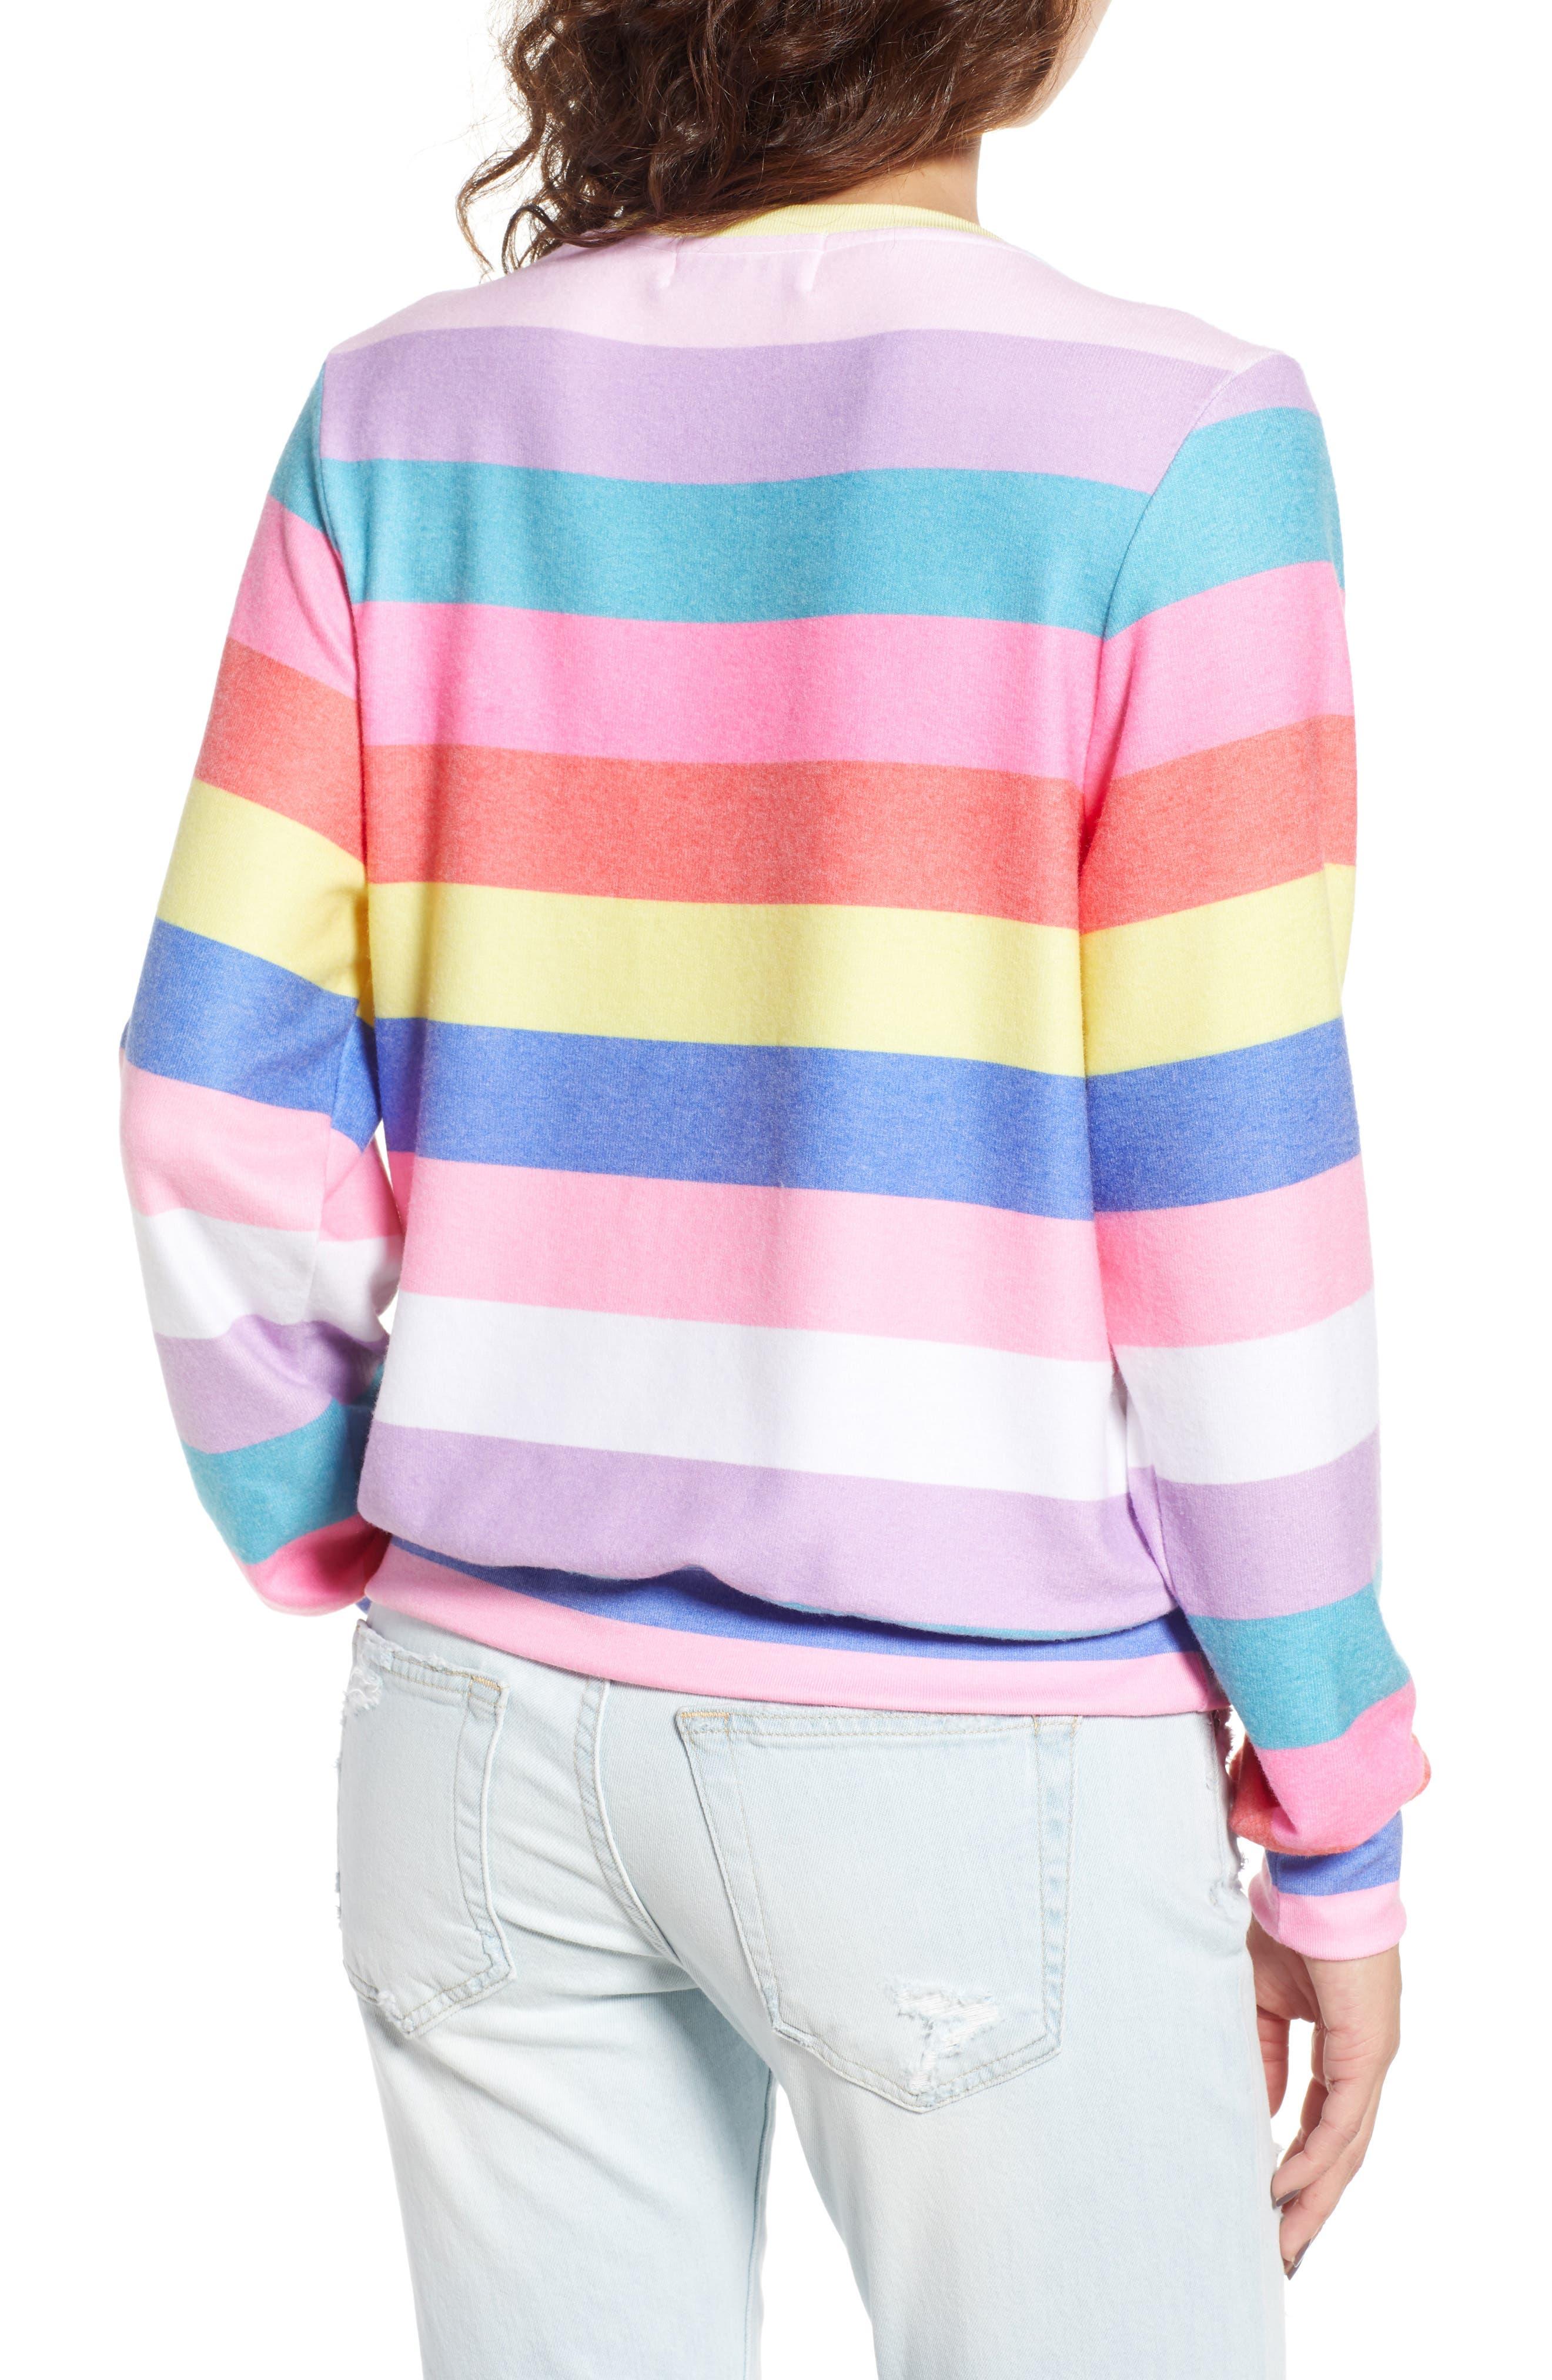 Castaway Roadtrip Sweatshirt,                             Alternate thumbnail 2, color,